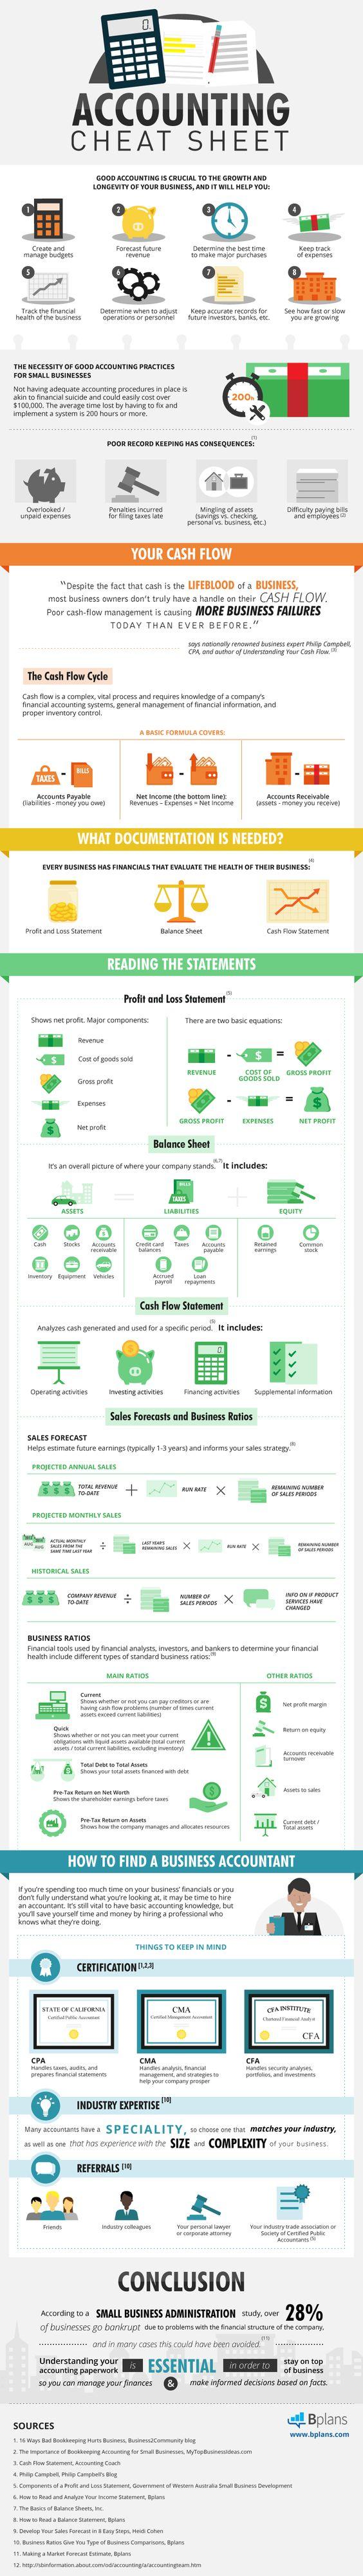 Accountant cheat sheet